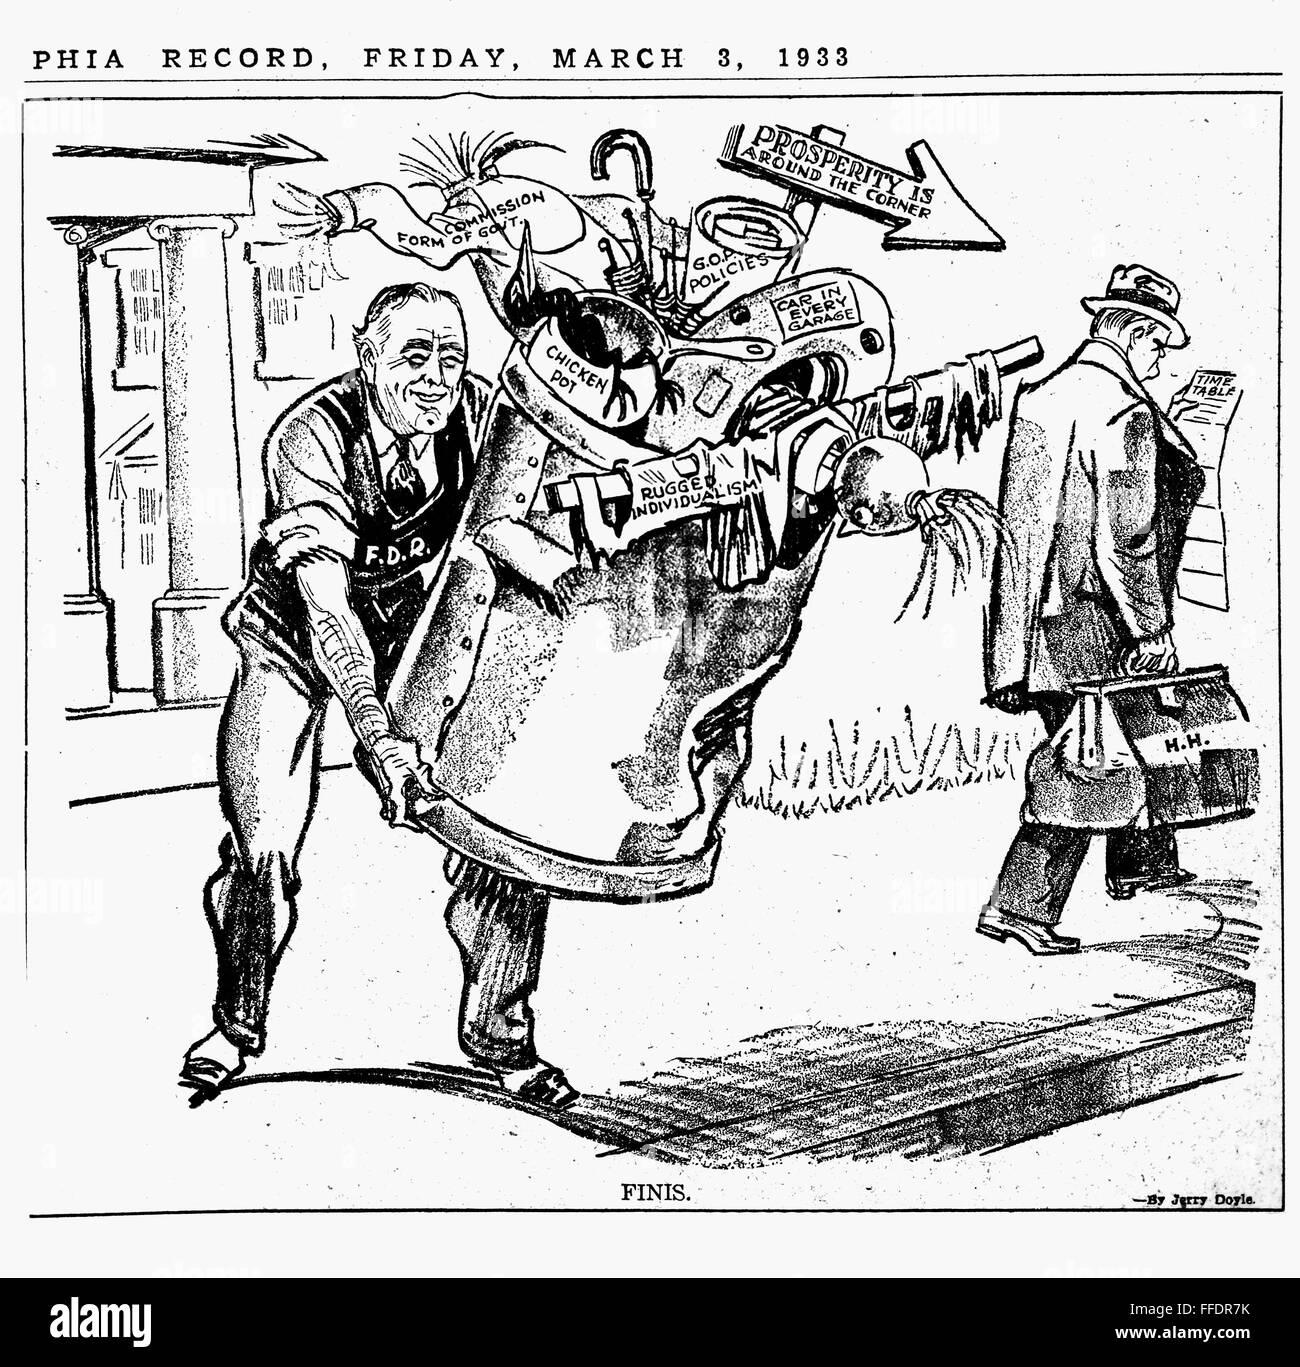 Cartoon Fdr Ncartoon Depicting Newly Elected